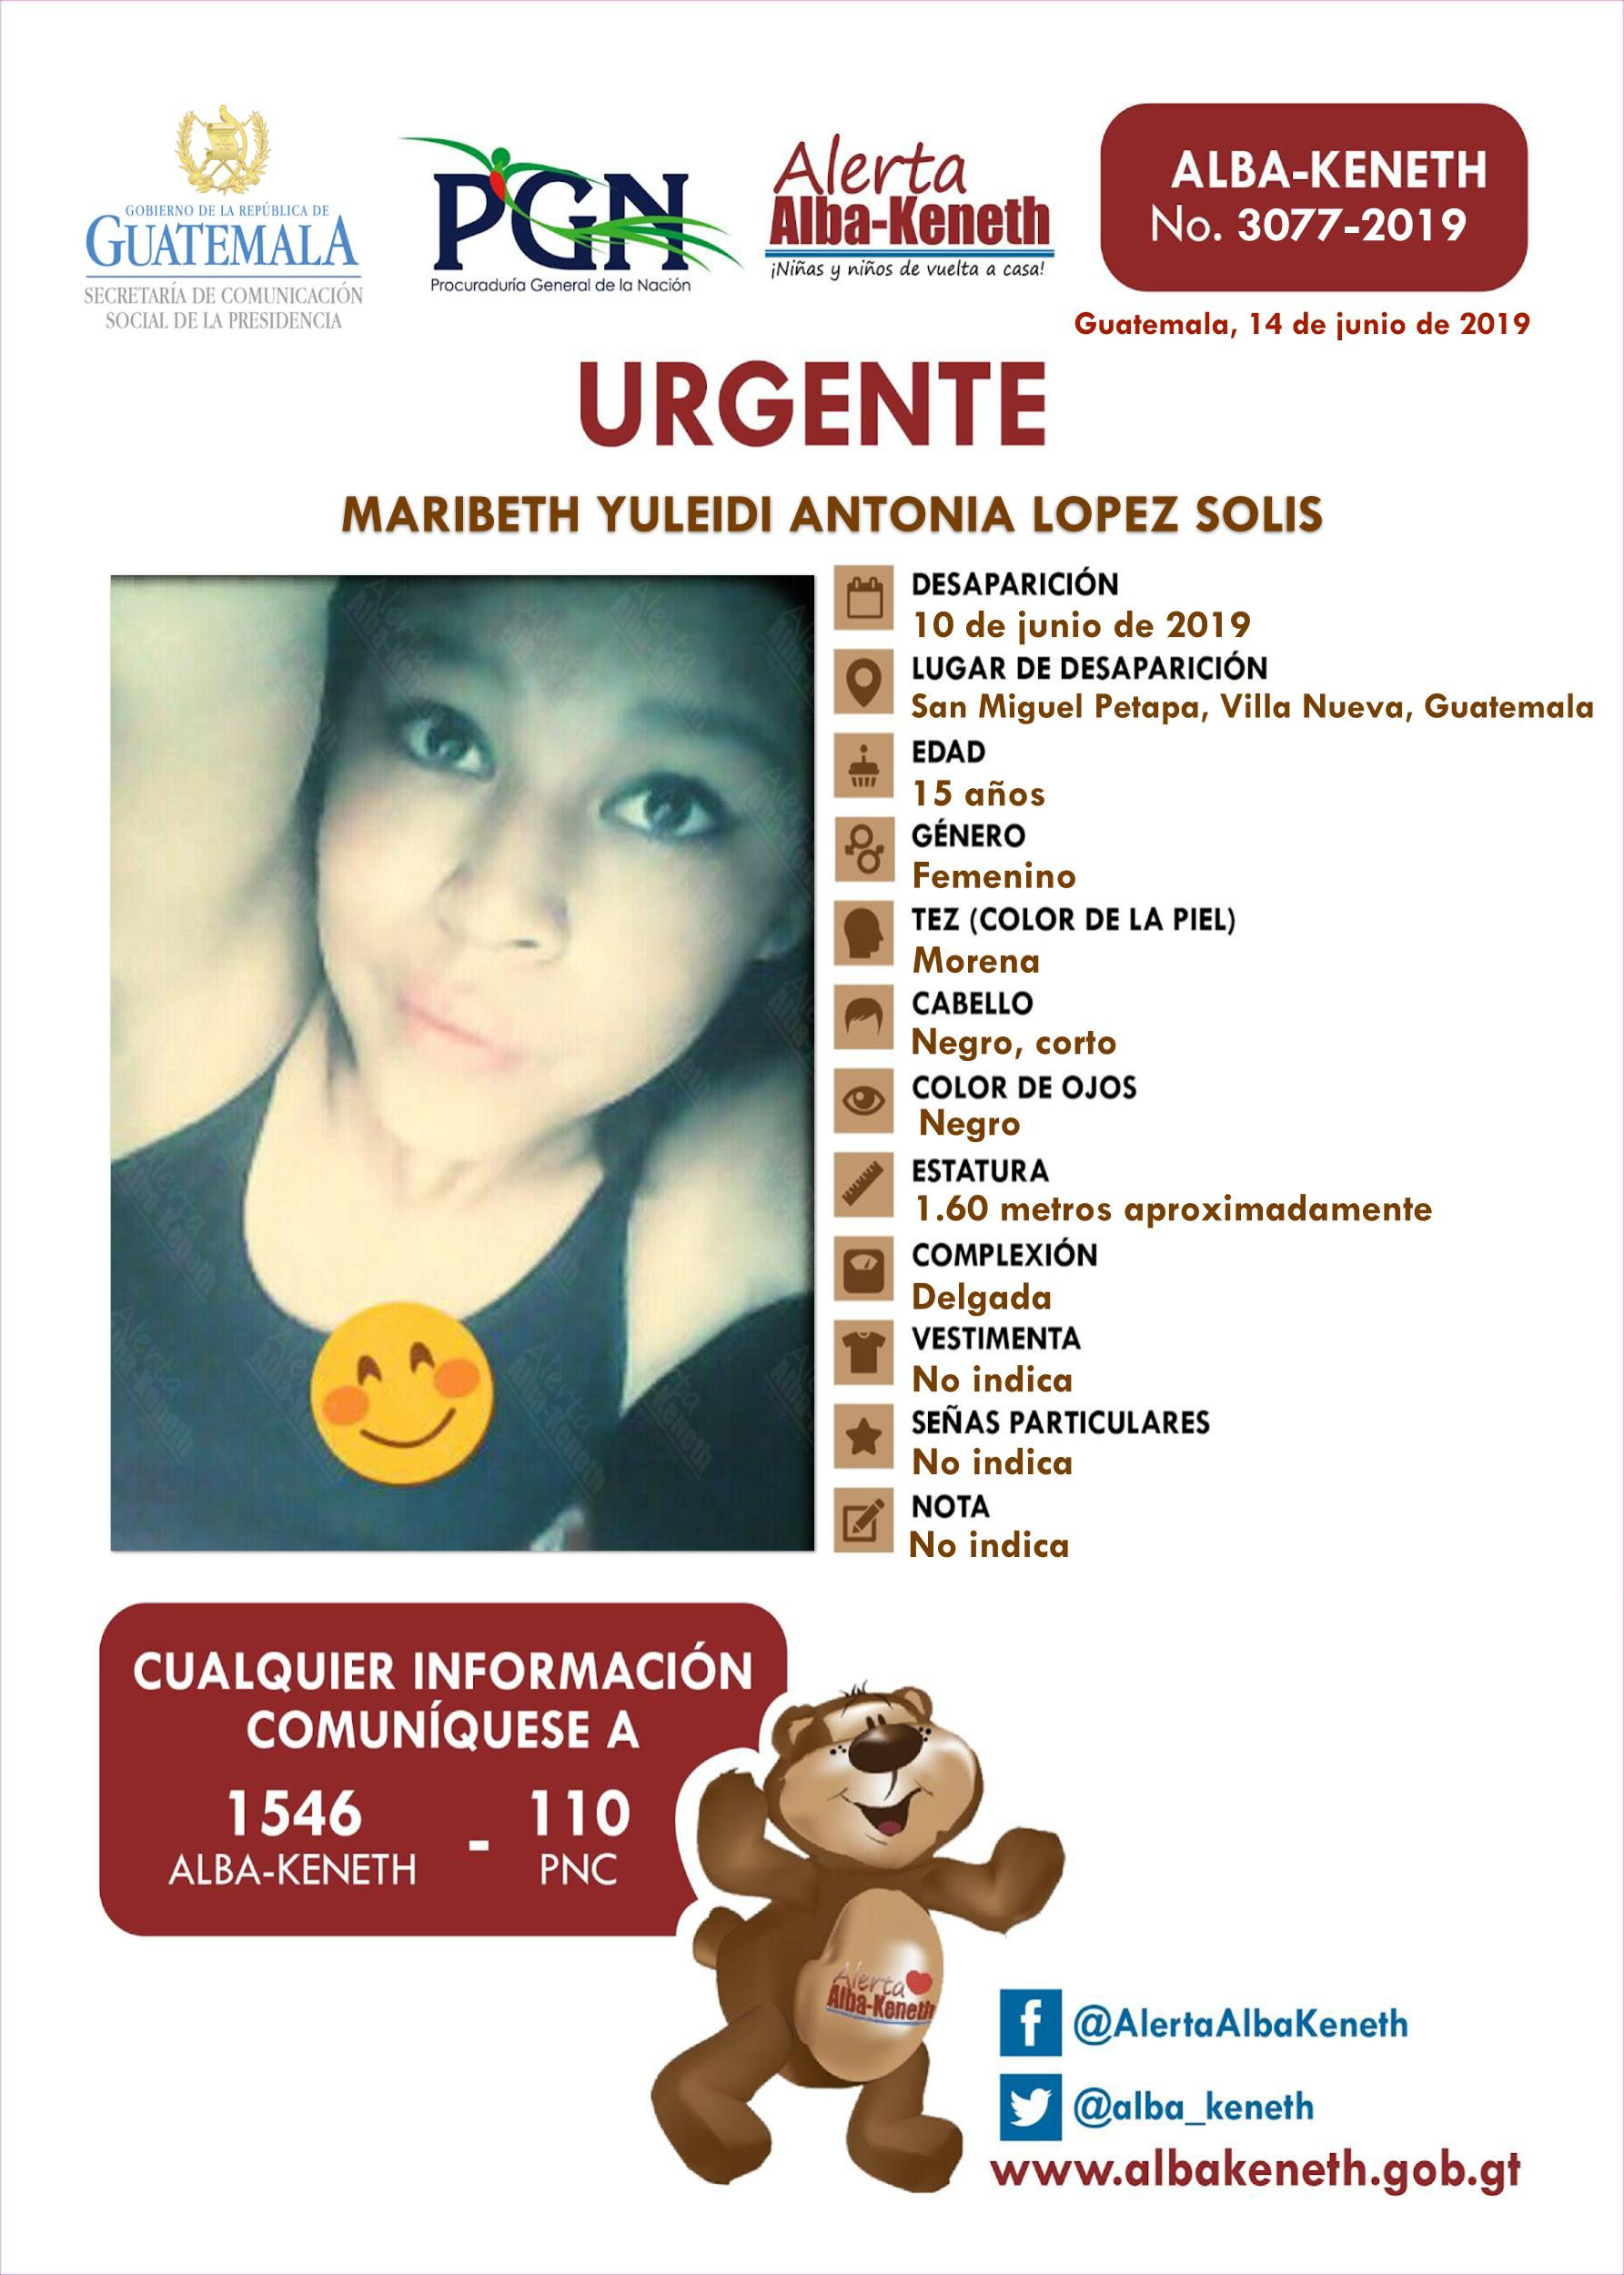 Maribeth Yuleidi Antonia Lopez Solis